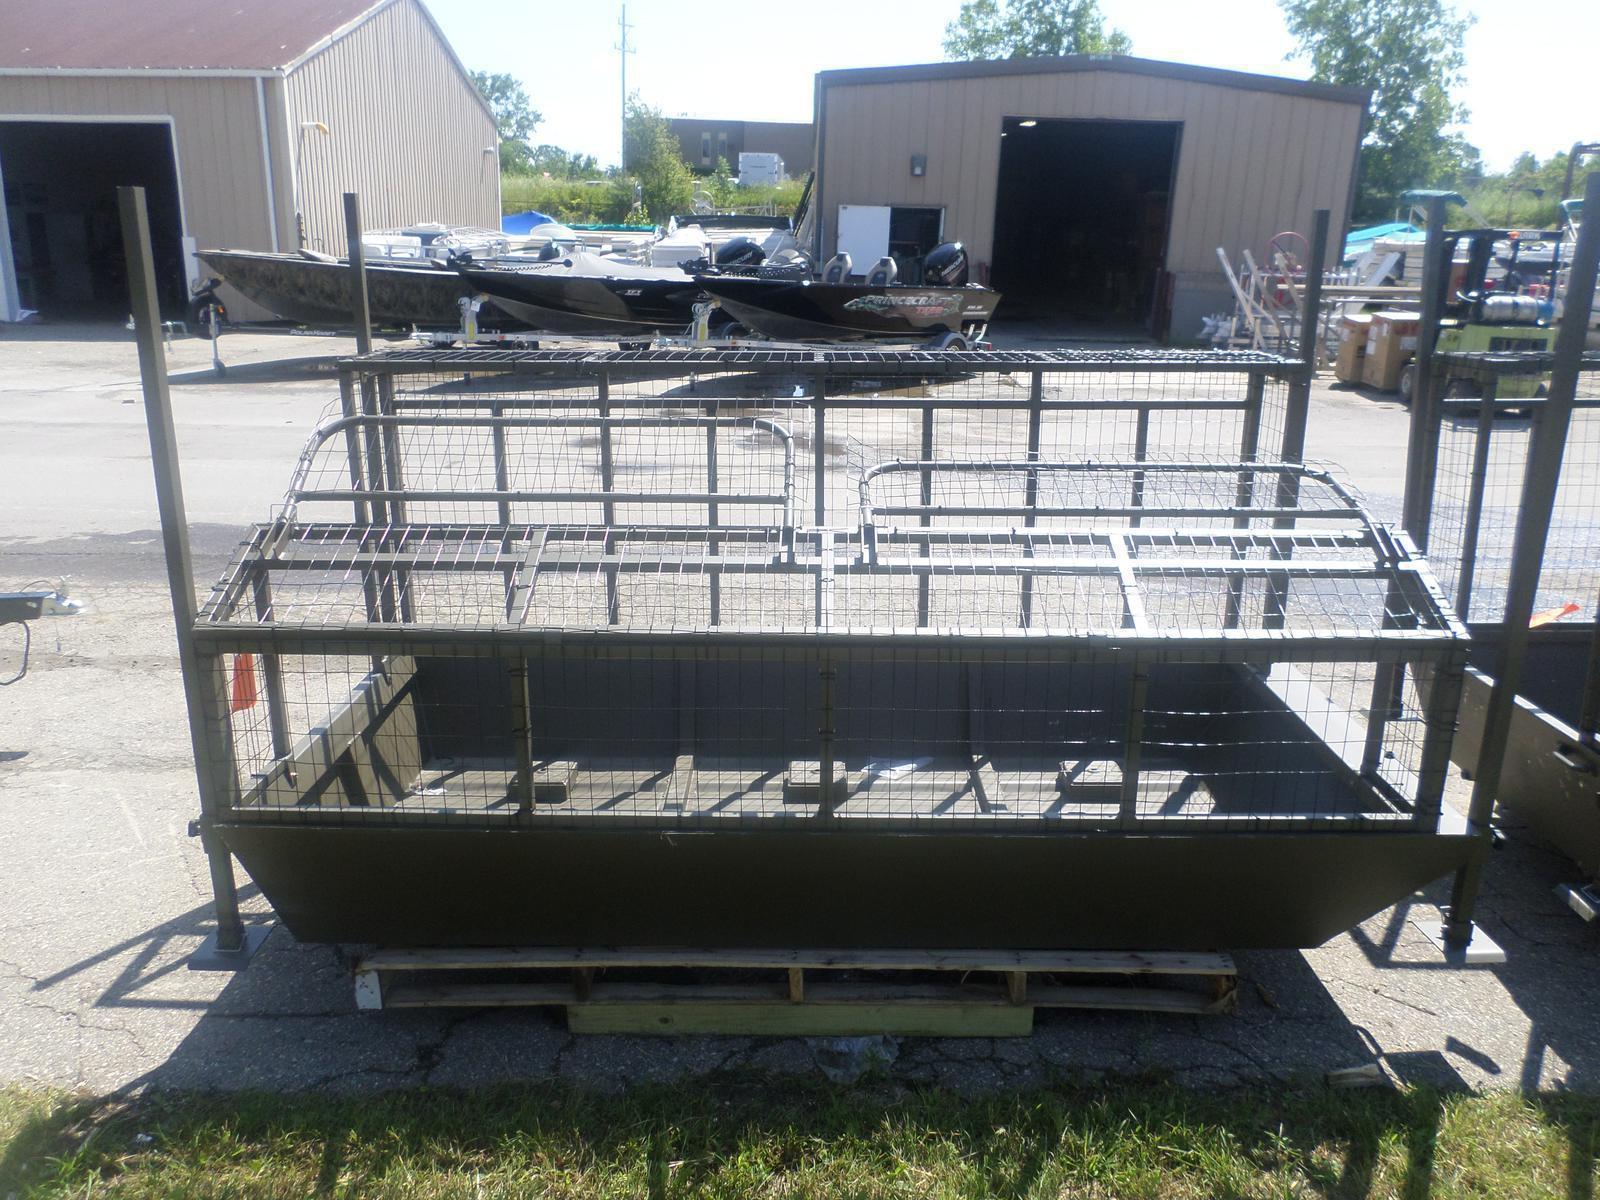 2017 Gator Trax Gator s Nest for sale in Fenton MI